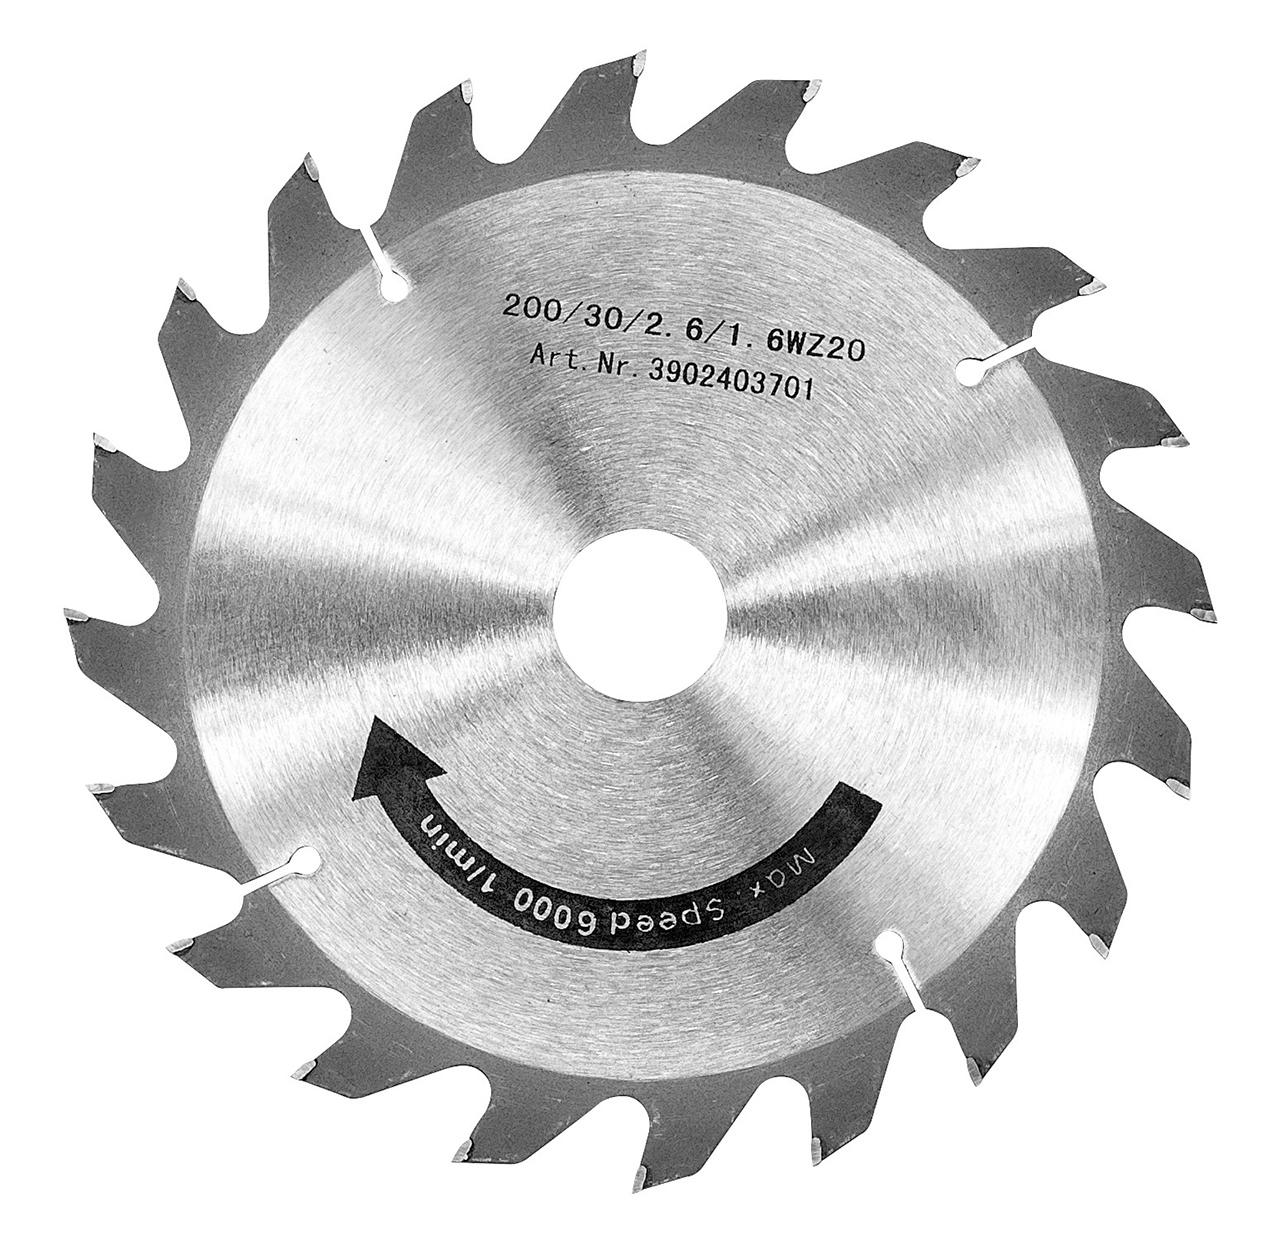 Tarcza tnąca 200 x 3,0 x 30 mm, Z20 BERNARDO